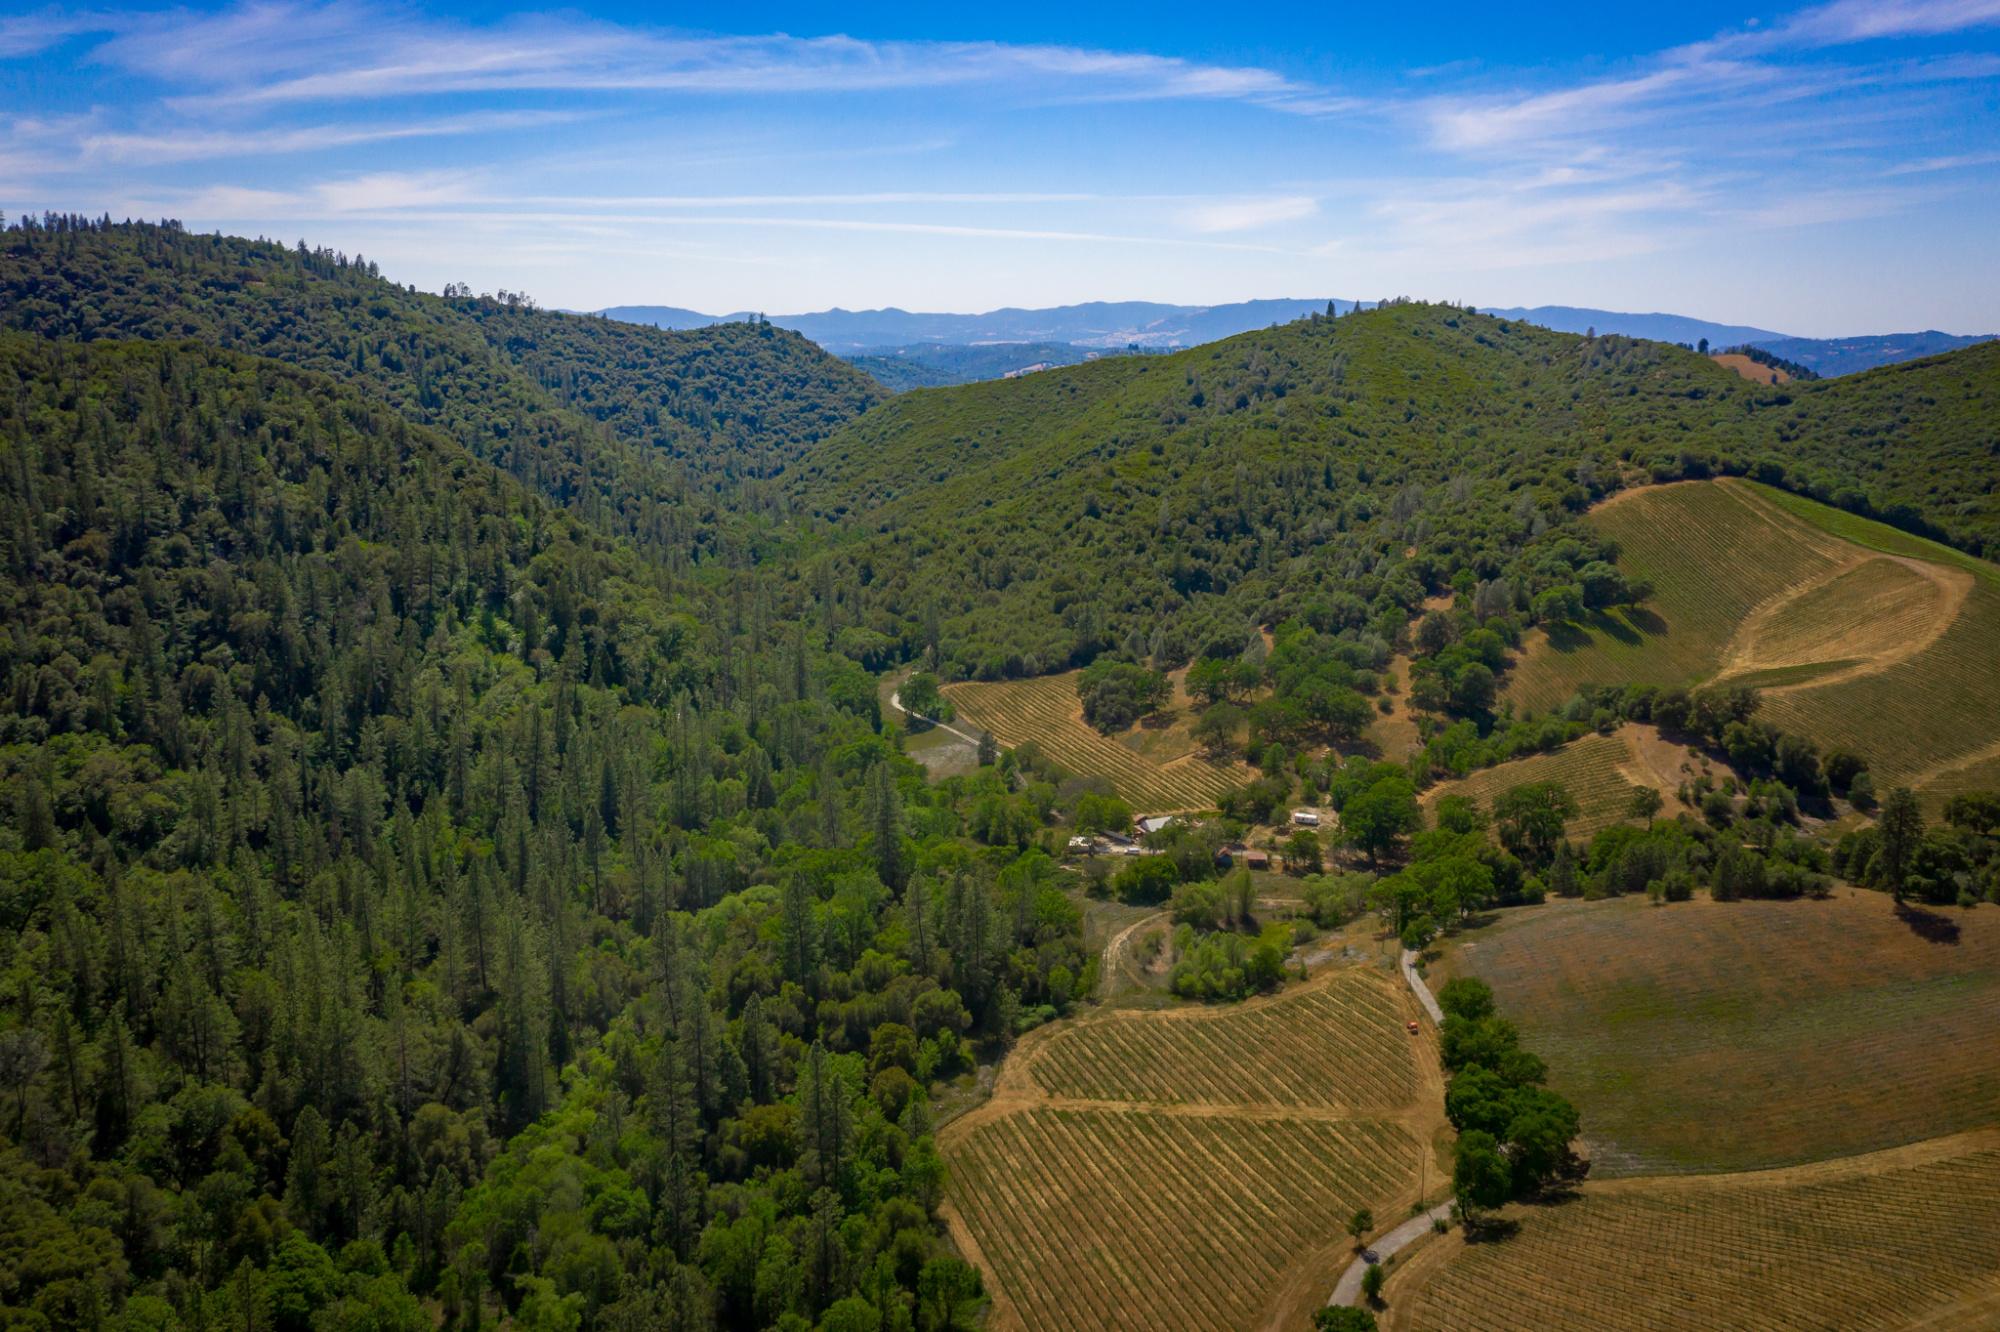 Premium Vineyard and Winery Sierra Foothills Calaveras County